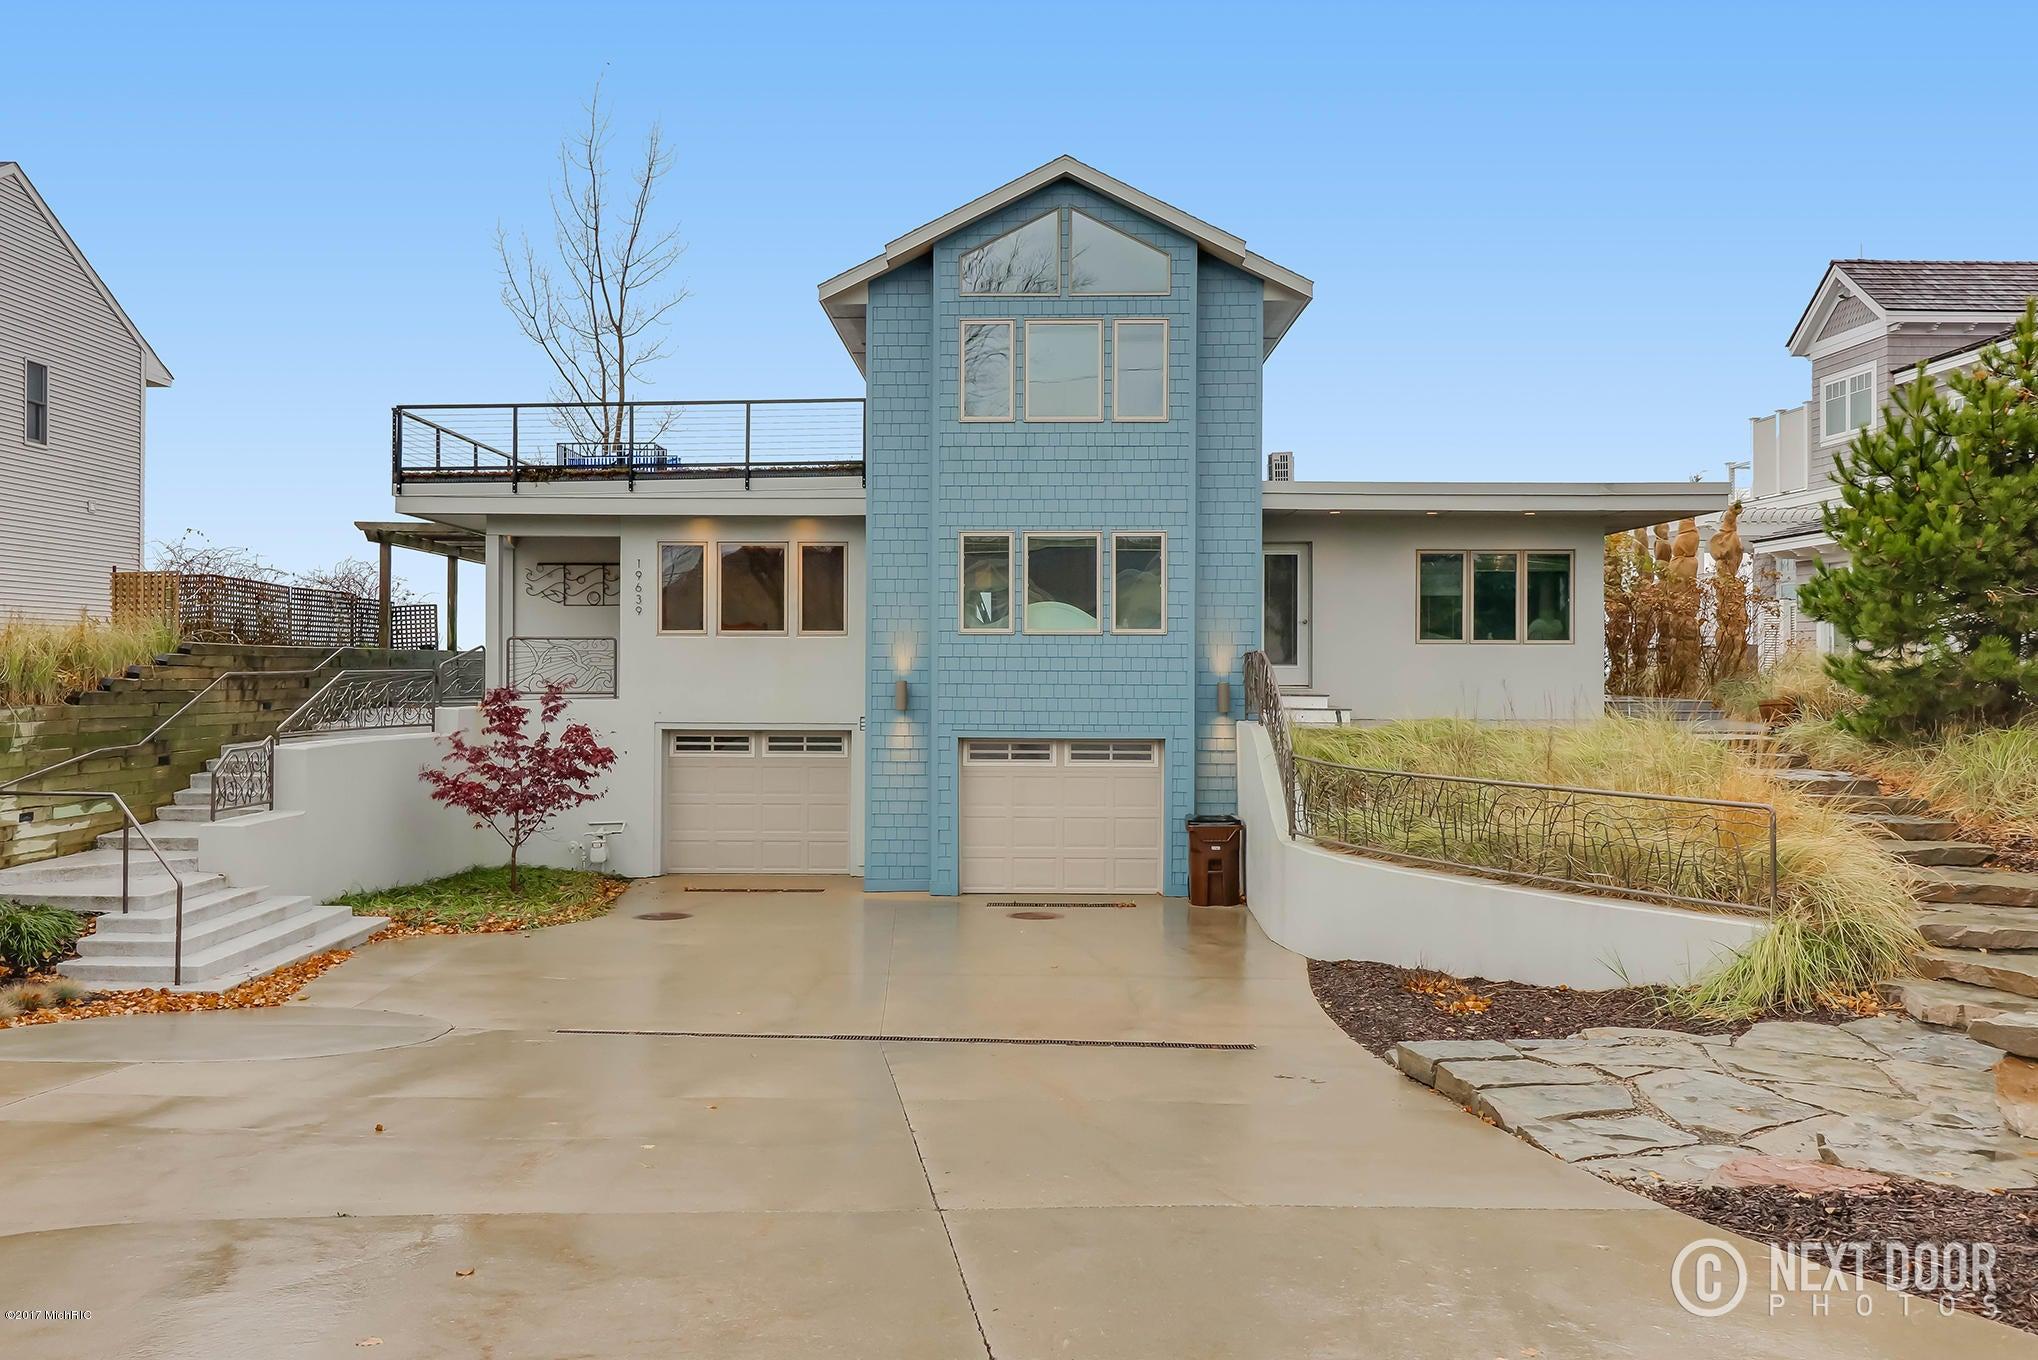 独户住宅 为 销售 在 19639 North Shore 19639 North Shore 斯普林莱克, 密歇根州 49456 美国